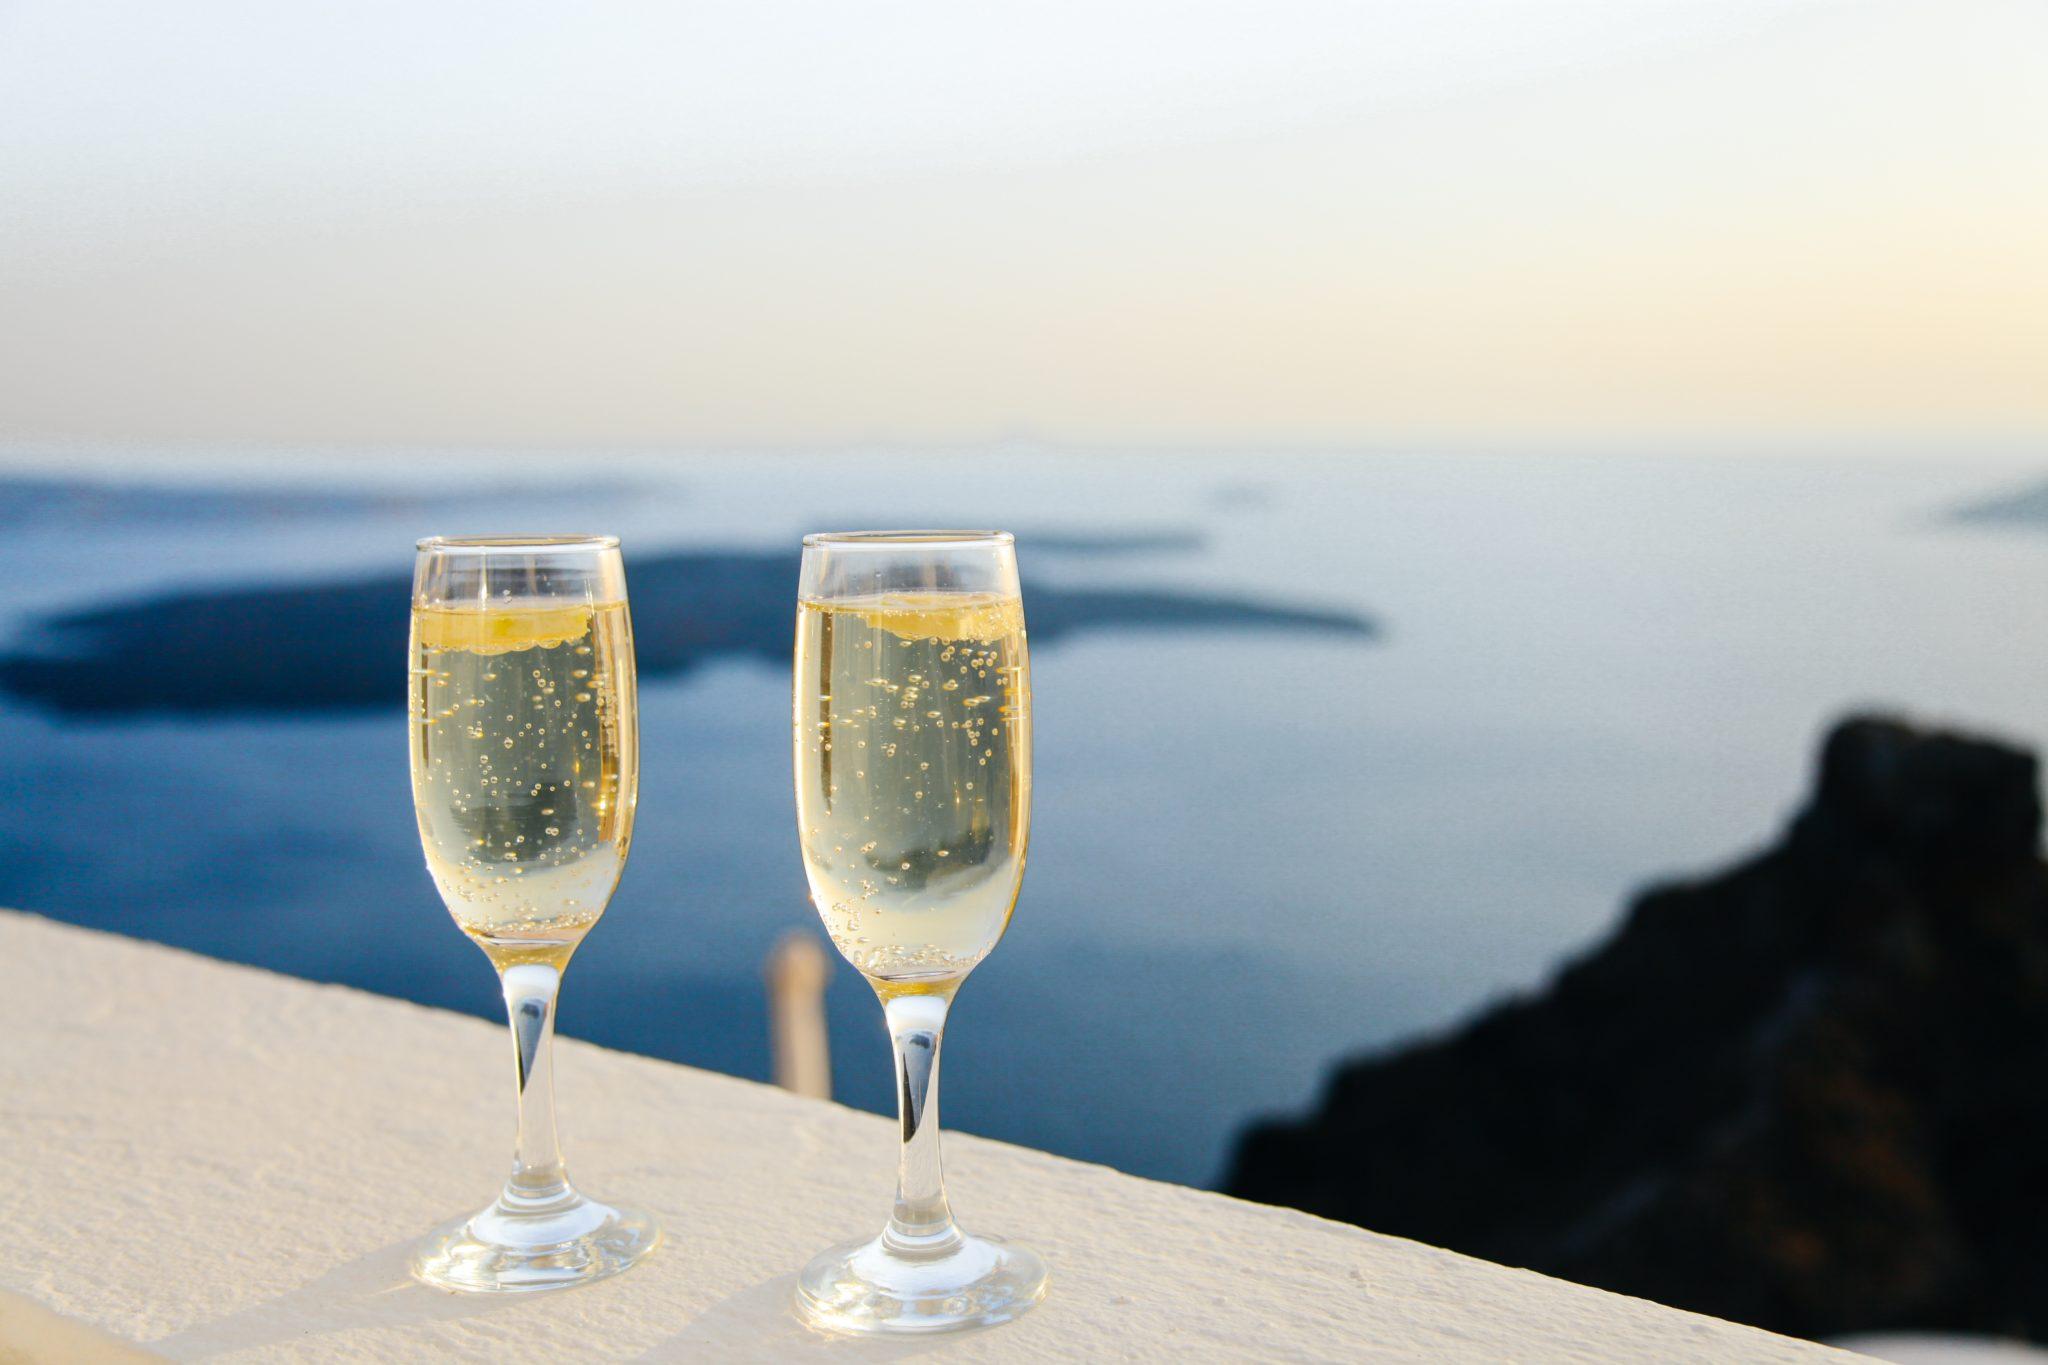 7 Cruise Hacks: Wine and Liquor